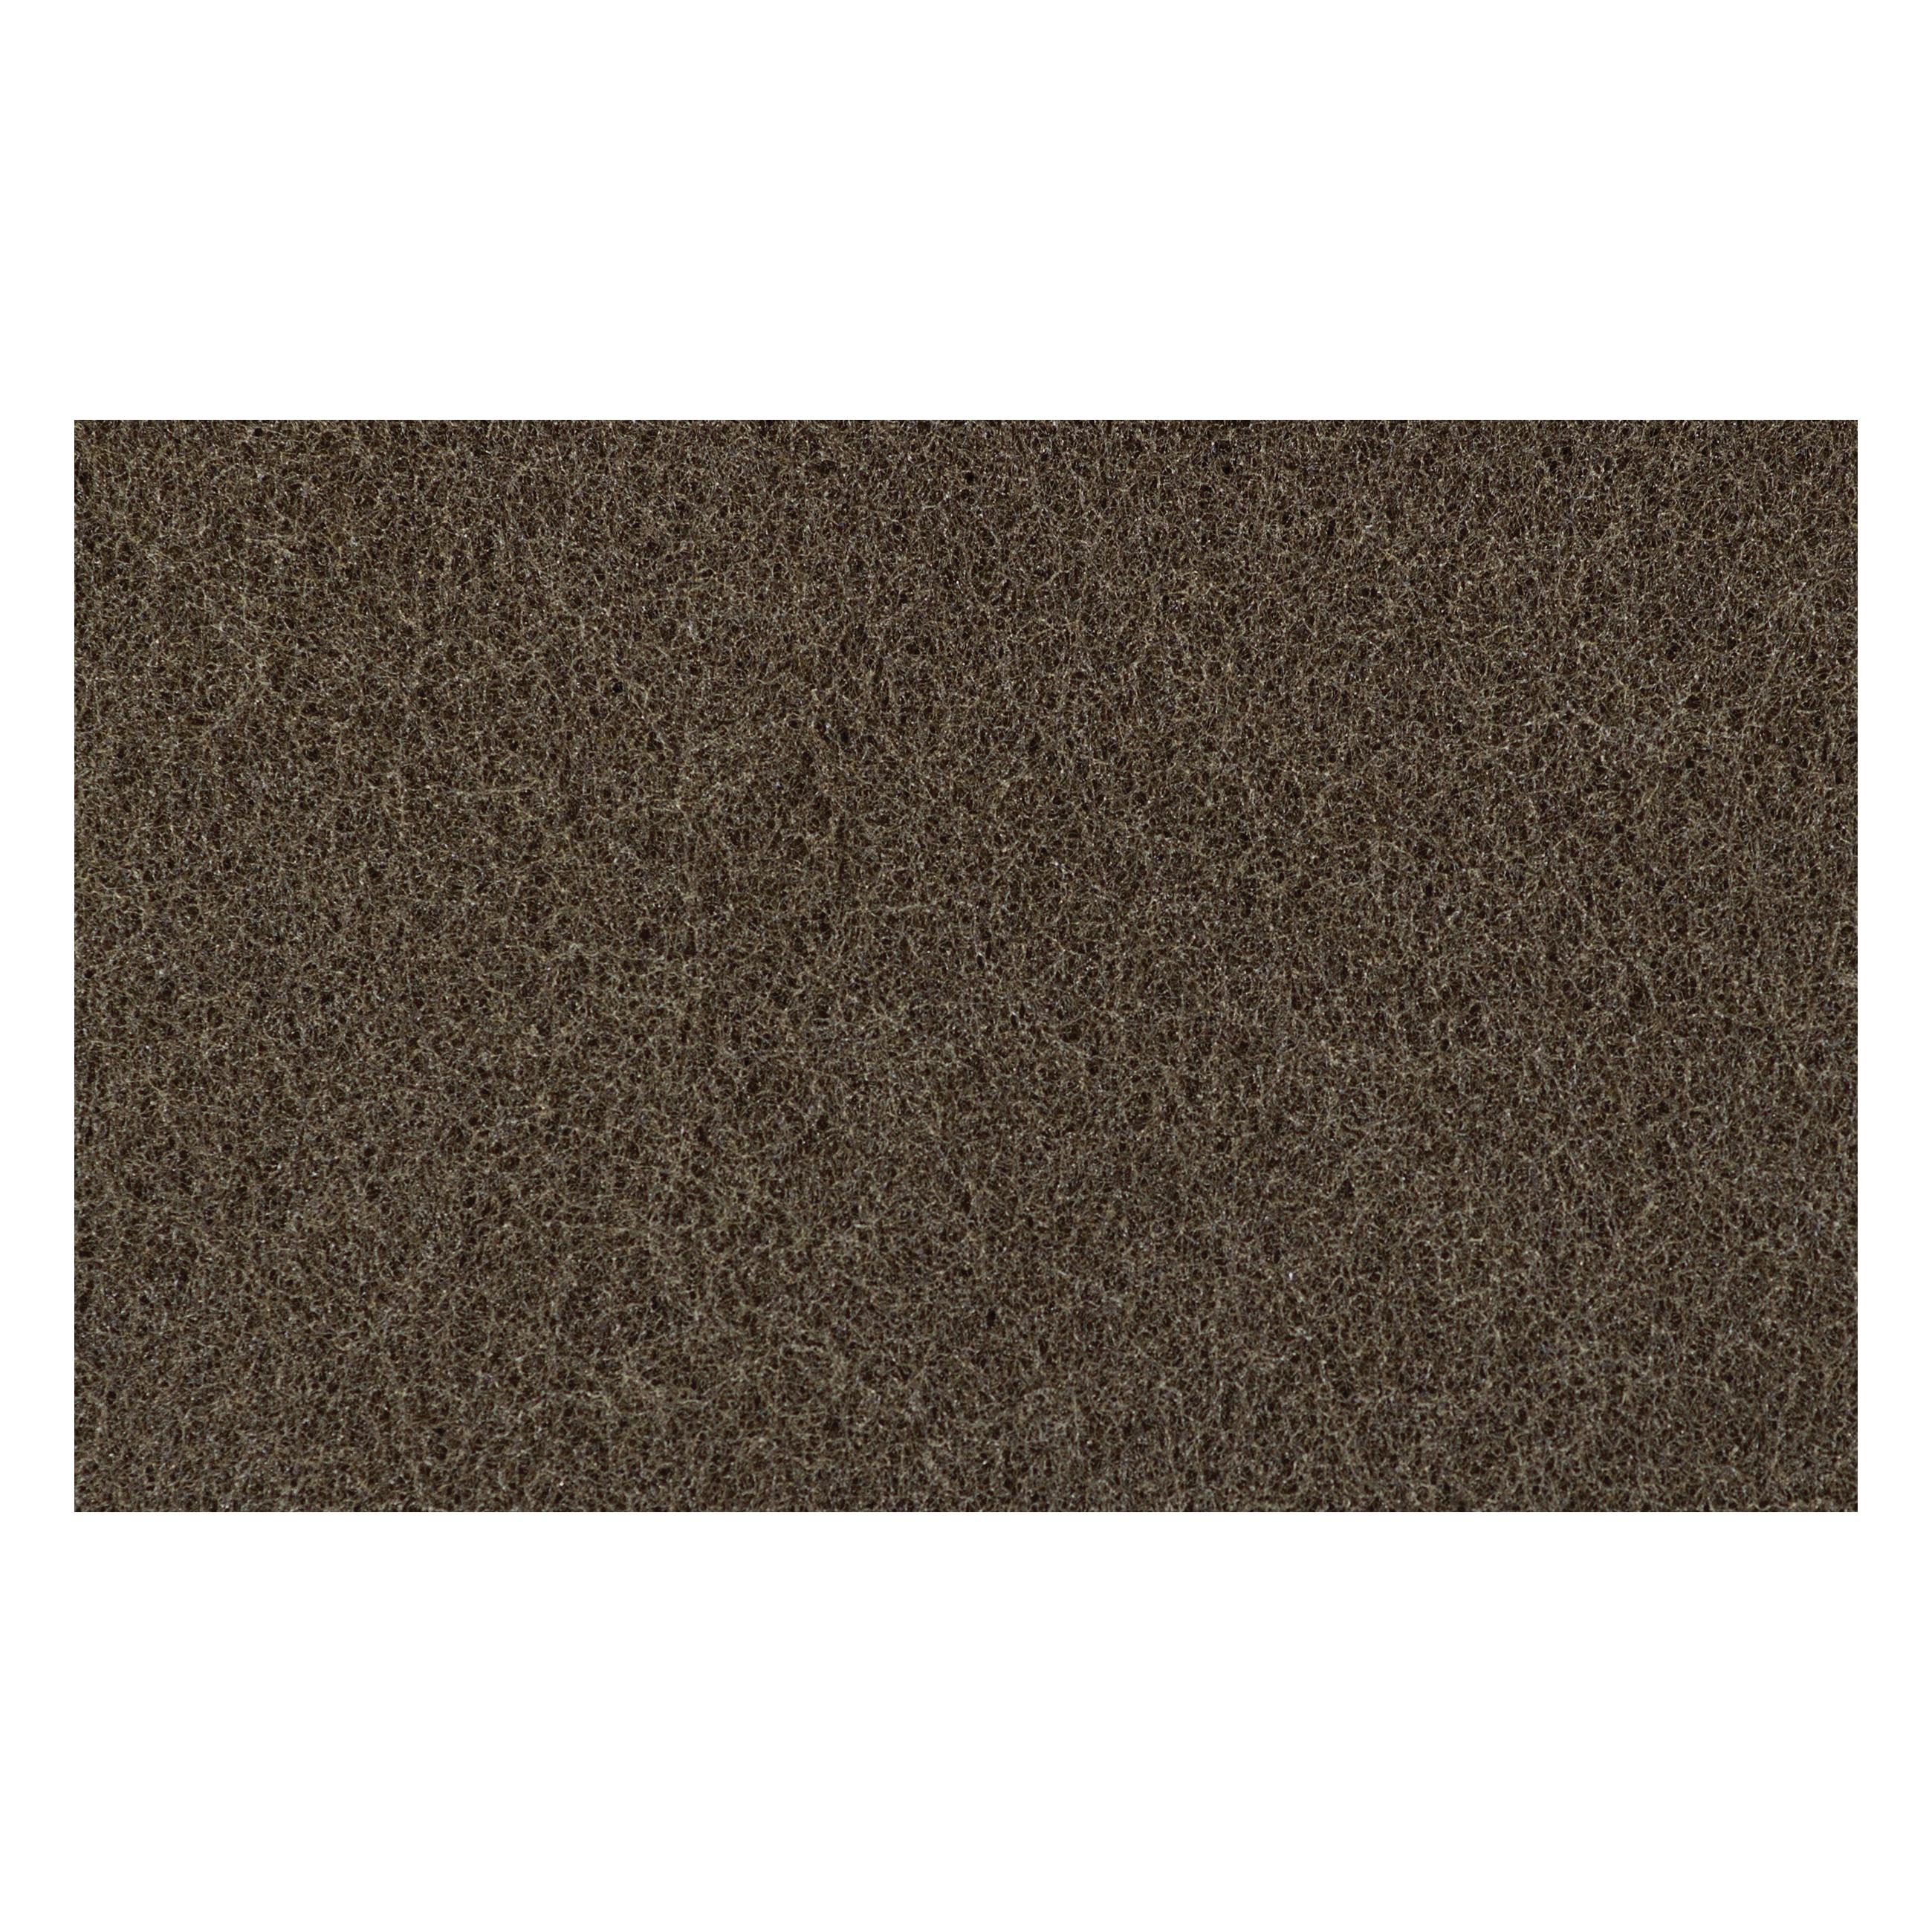 Scotch-Brite™ 048011-00233 CP-SH Waterproof Non-Woven Sanding Sheet, 11 in L x 9 in W, Medium Grade, Aluminum Oxide Abrasive